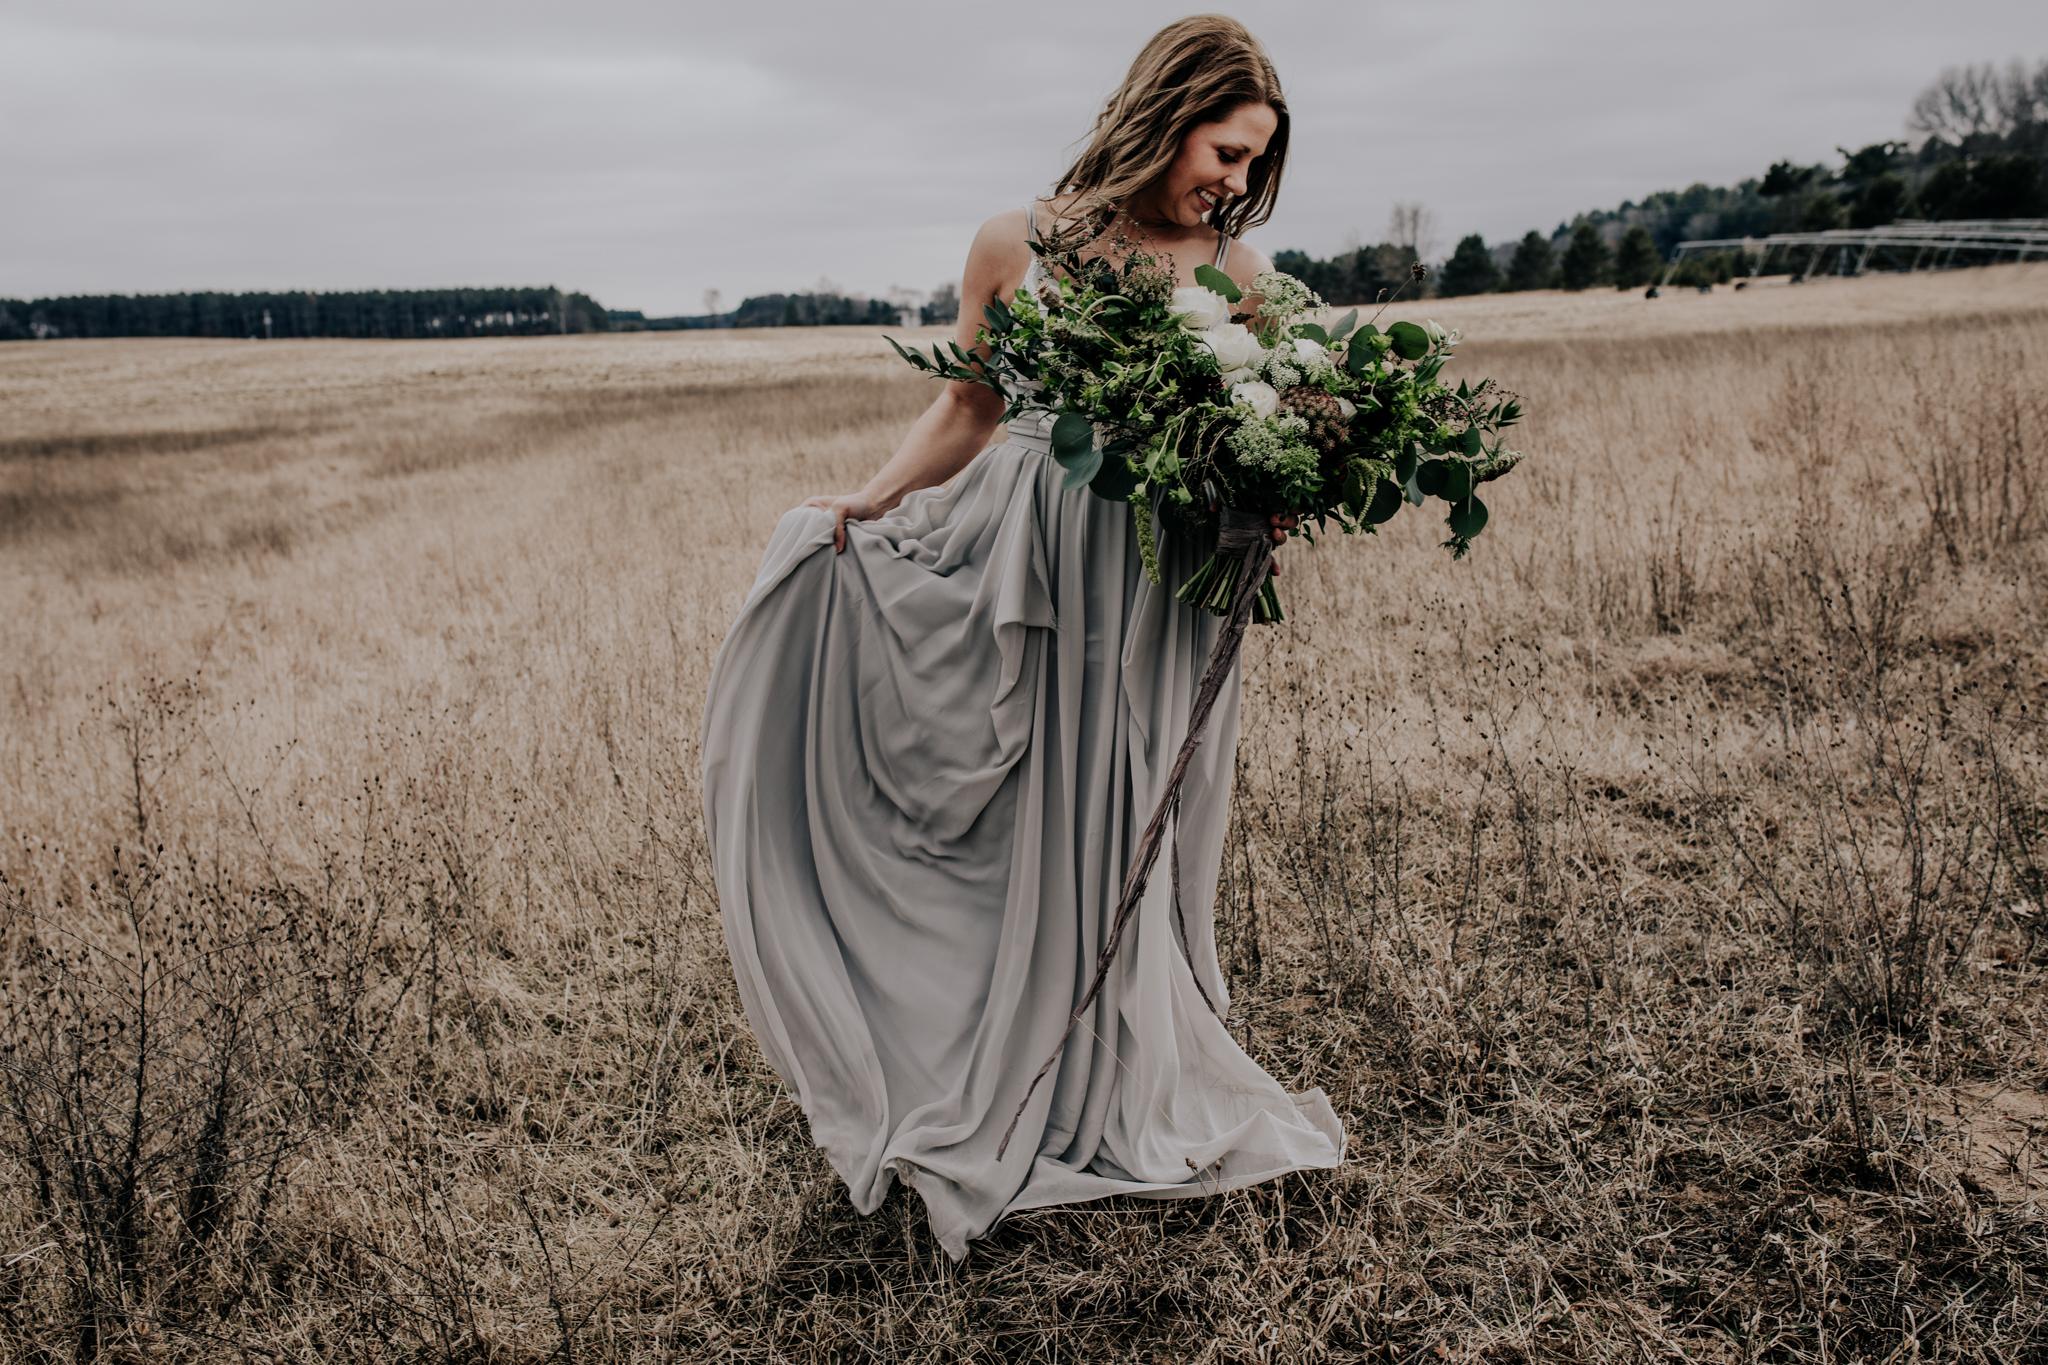 Monica Rose Freng Custom Wedding Gown - Flowy Gown - Large Green Bouquet - Eucalyptus Wedding - Adventure Elopement - Hove Photography